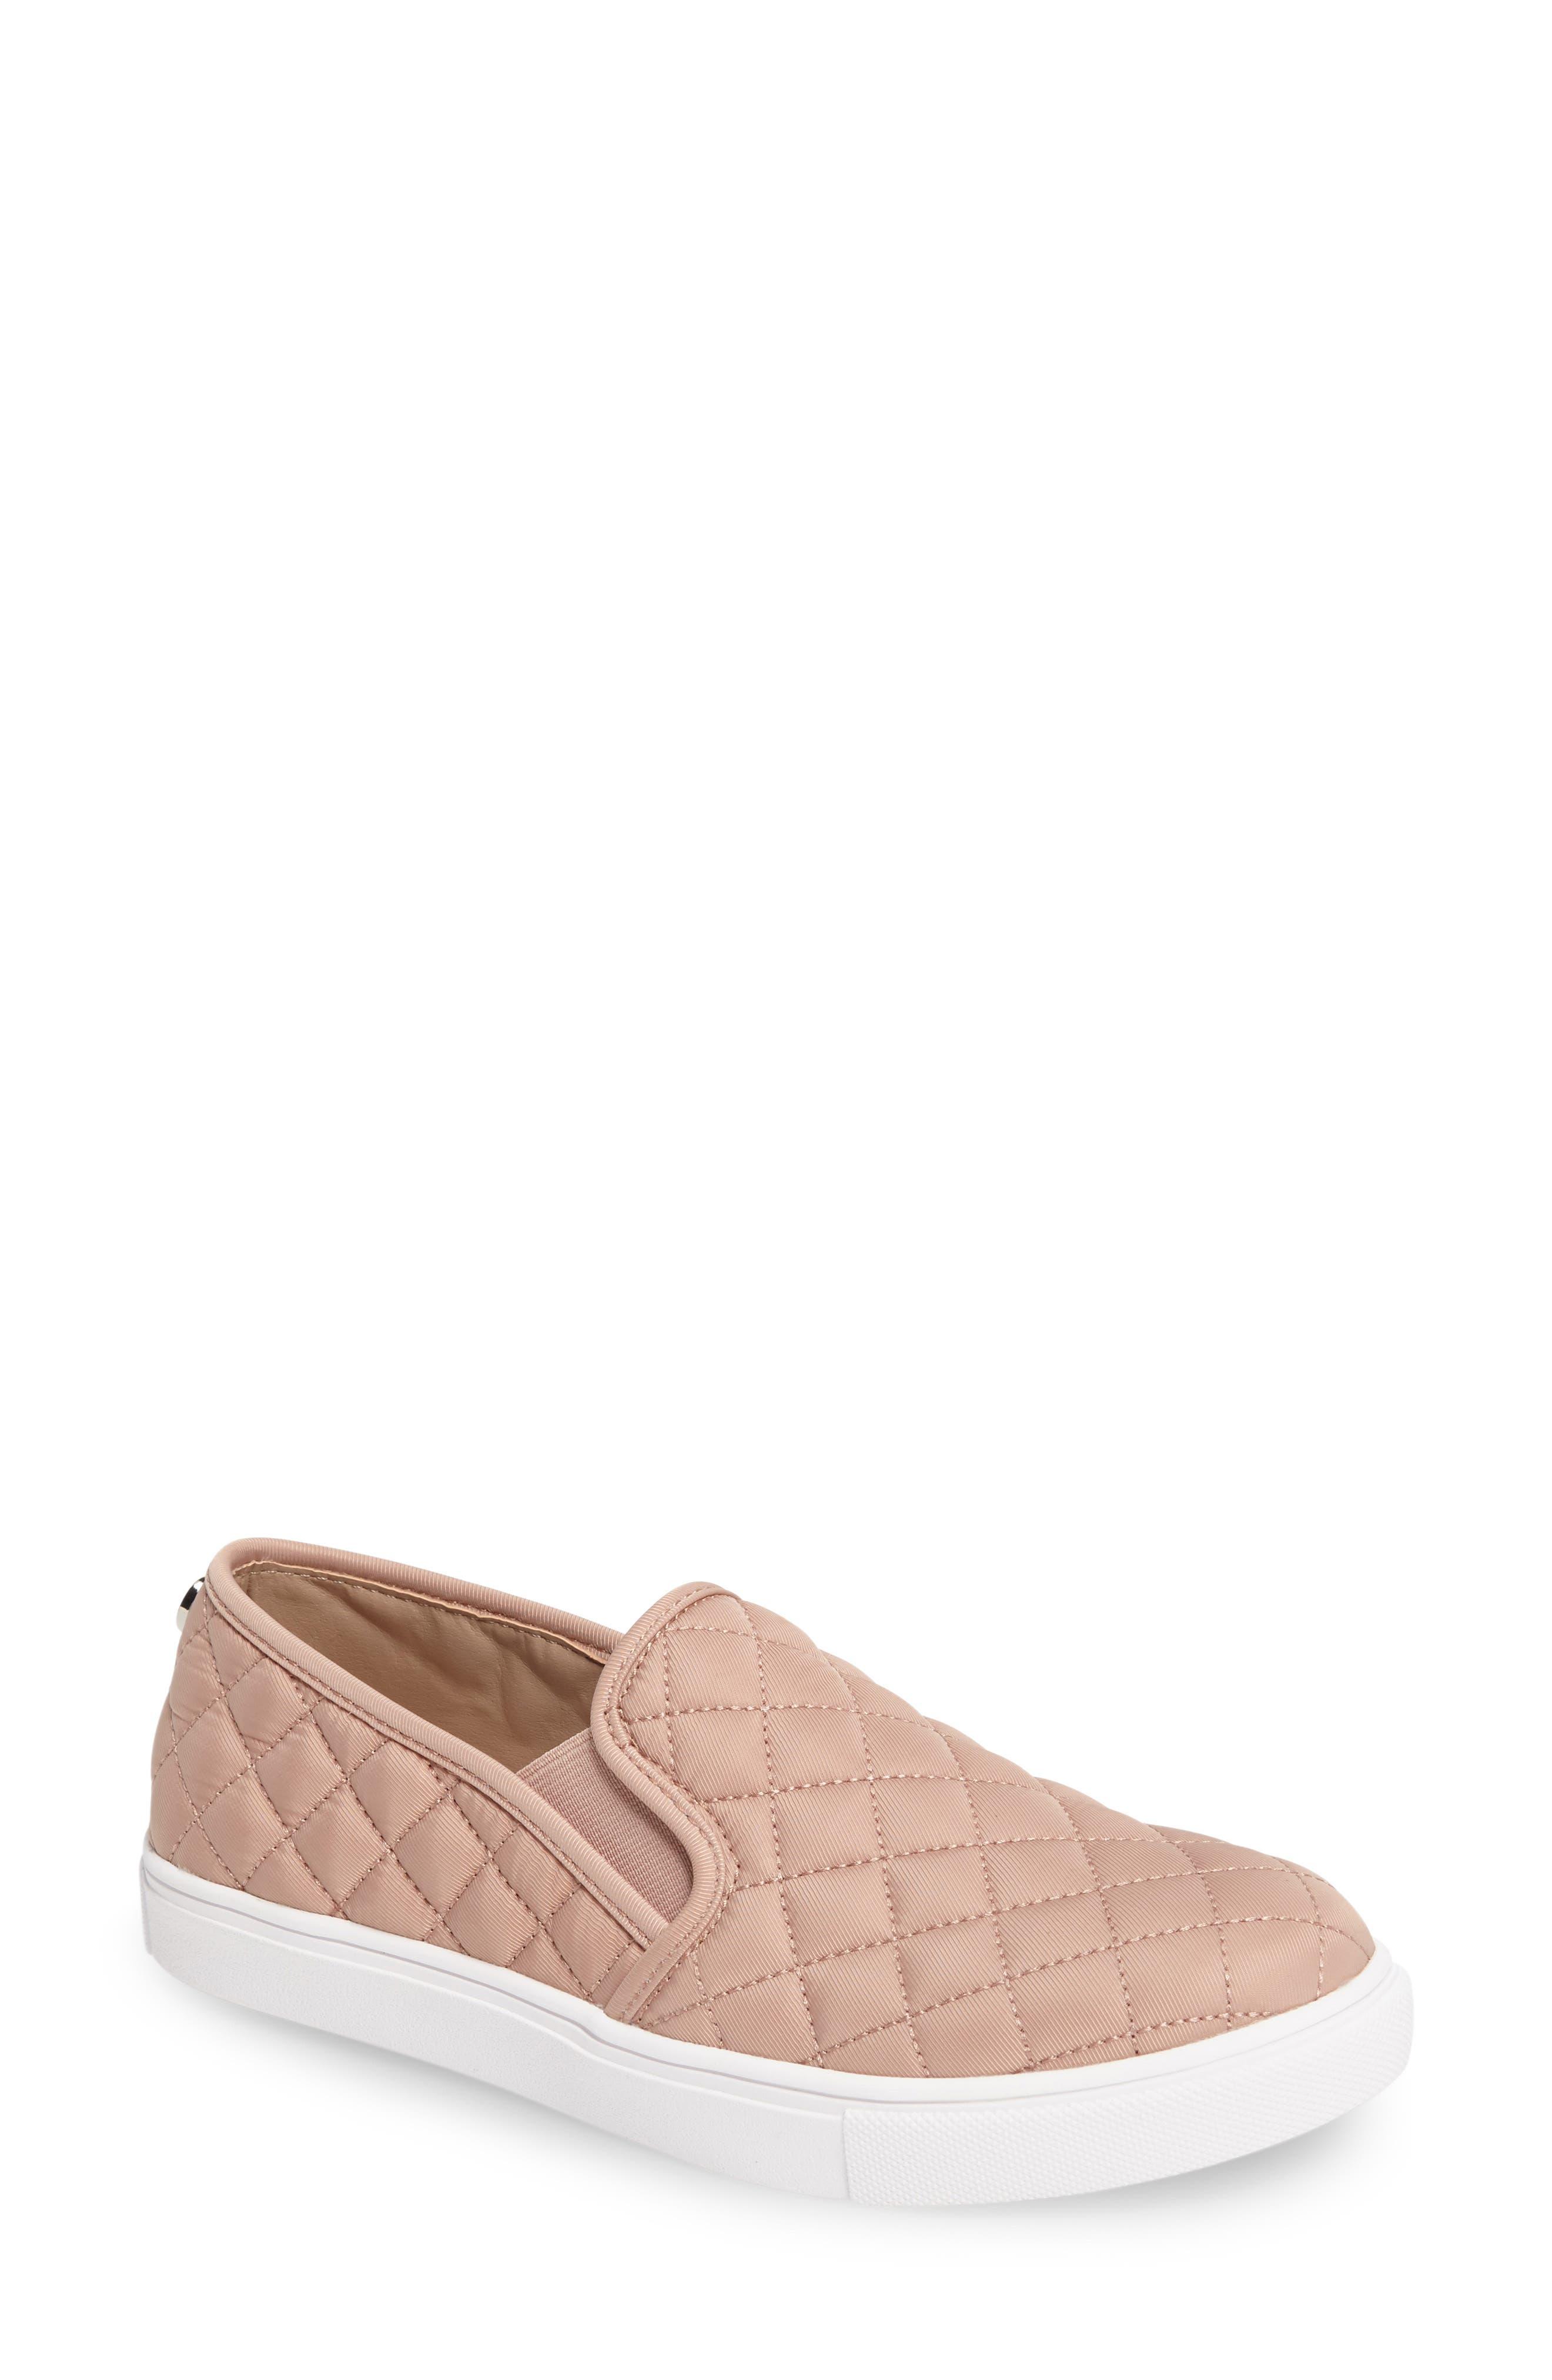 STEVE MADDEN, 'Ecntrcqt' Sneaker, Main thumbnail 1, color, BLUSH FABRIC